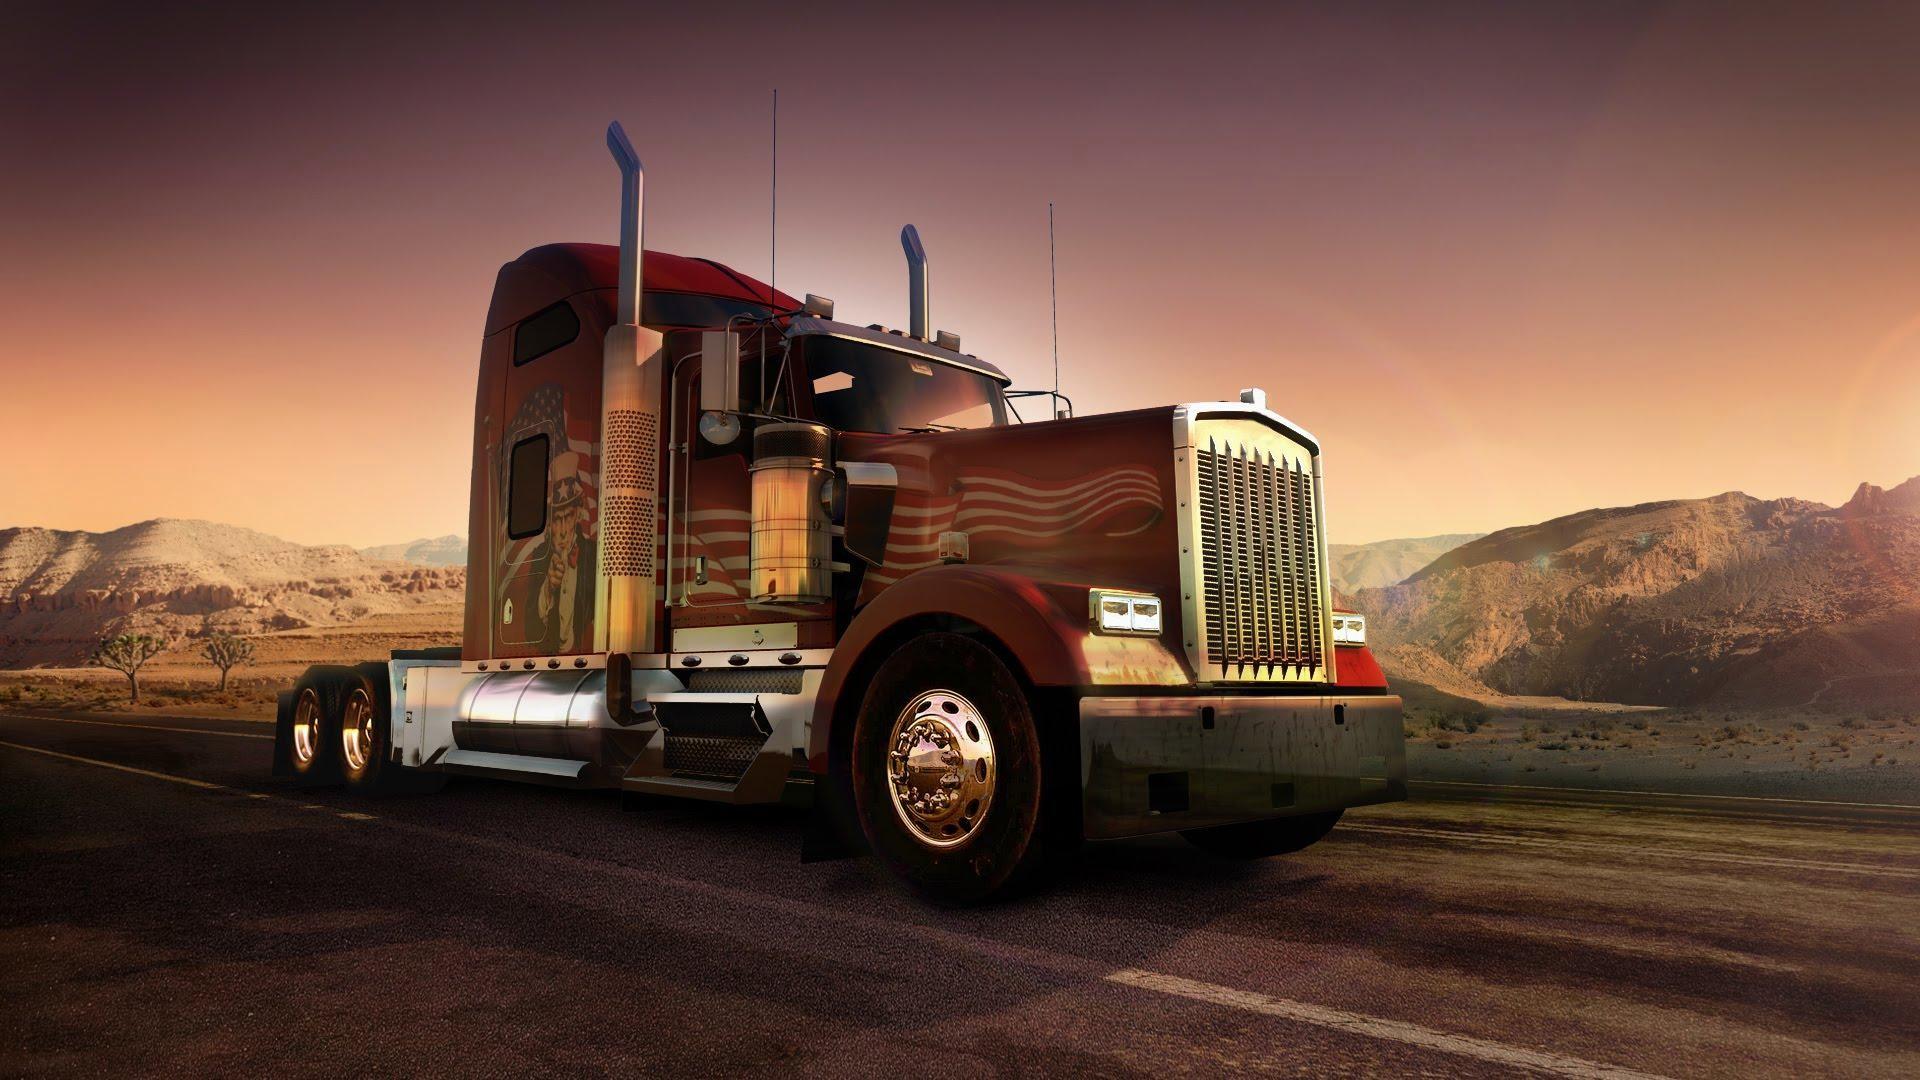 wallpaper.wiki-Semi-Truck-Desktop-Photos-PIC-WPE001150